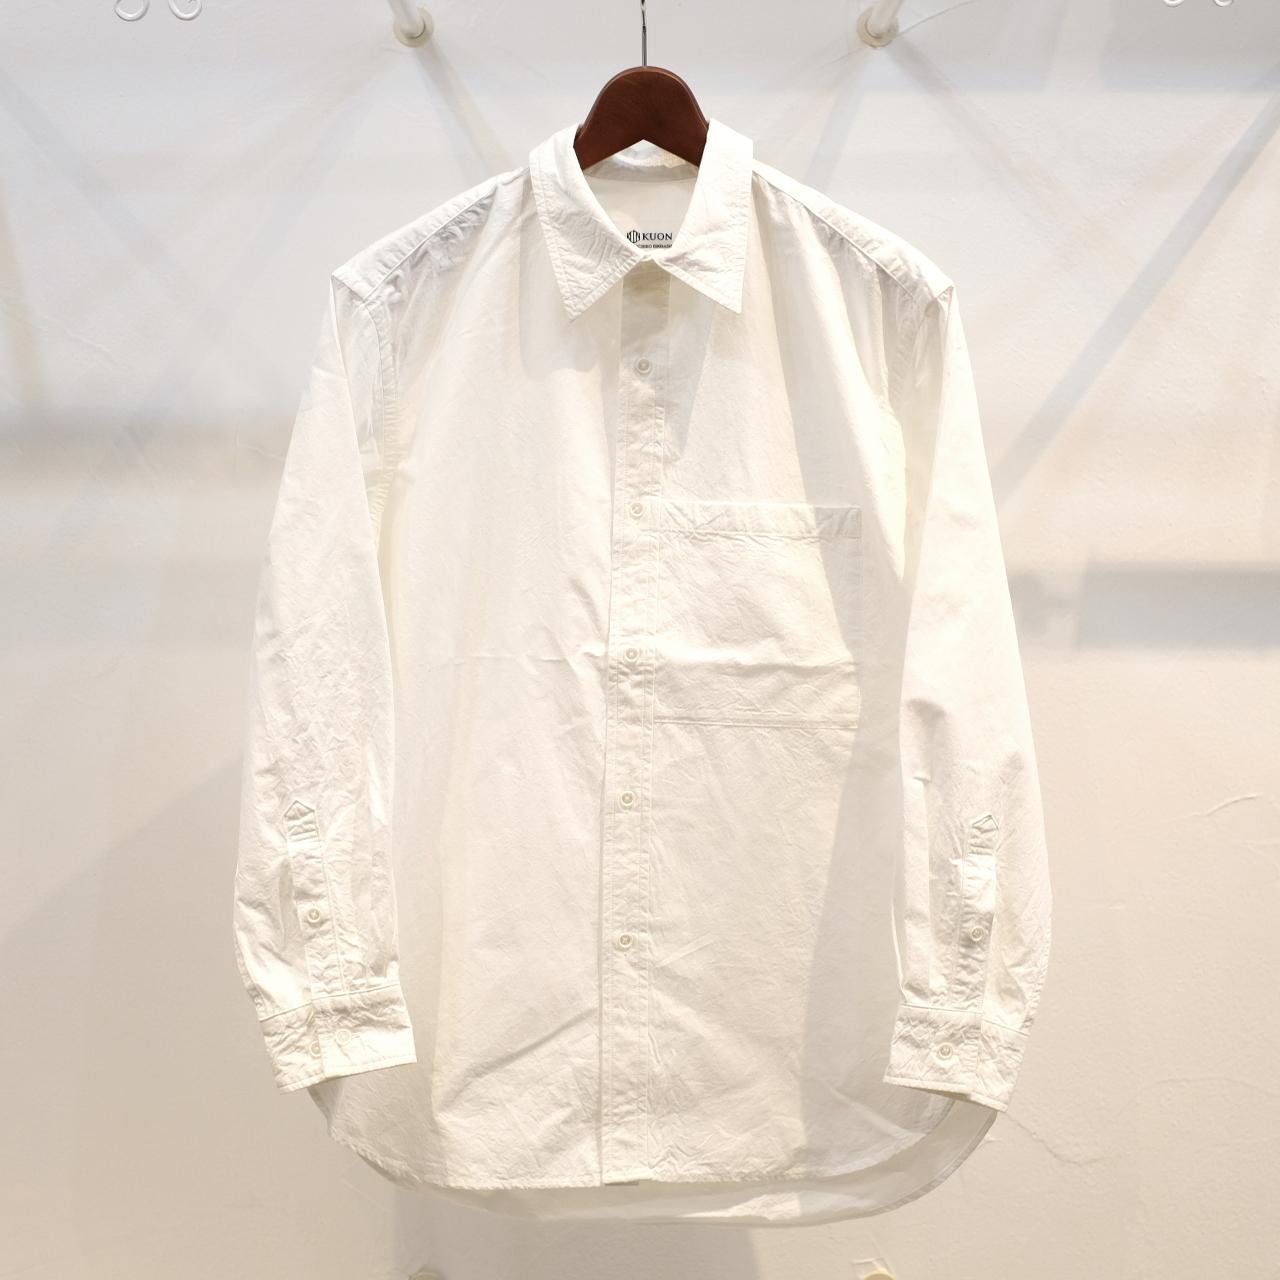 KUON(クオン) ファナージュコットンセミロングシャツ ホワイト